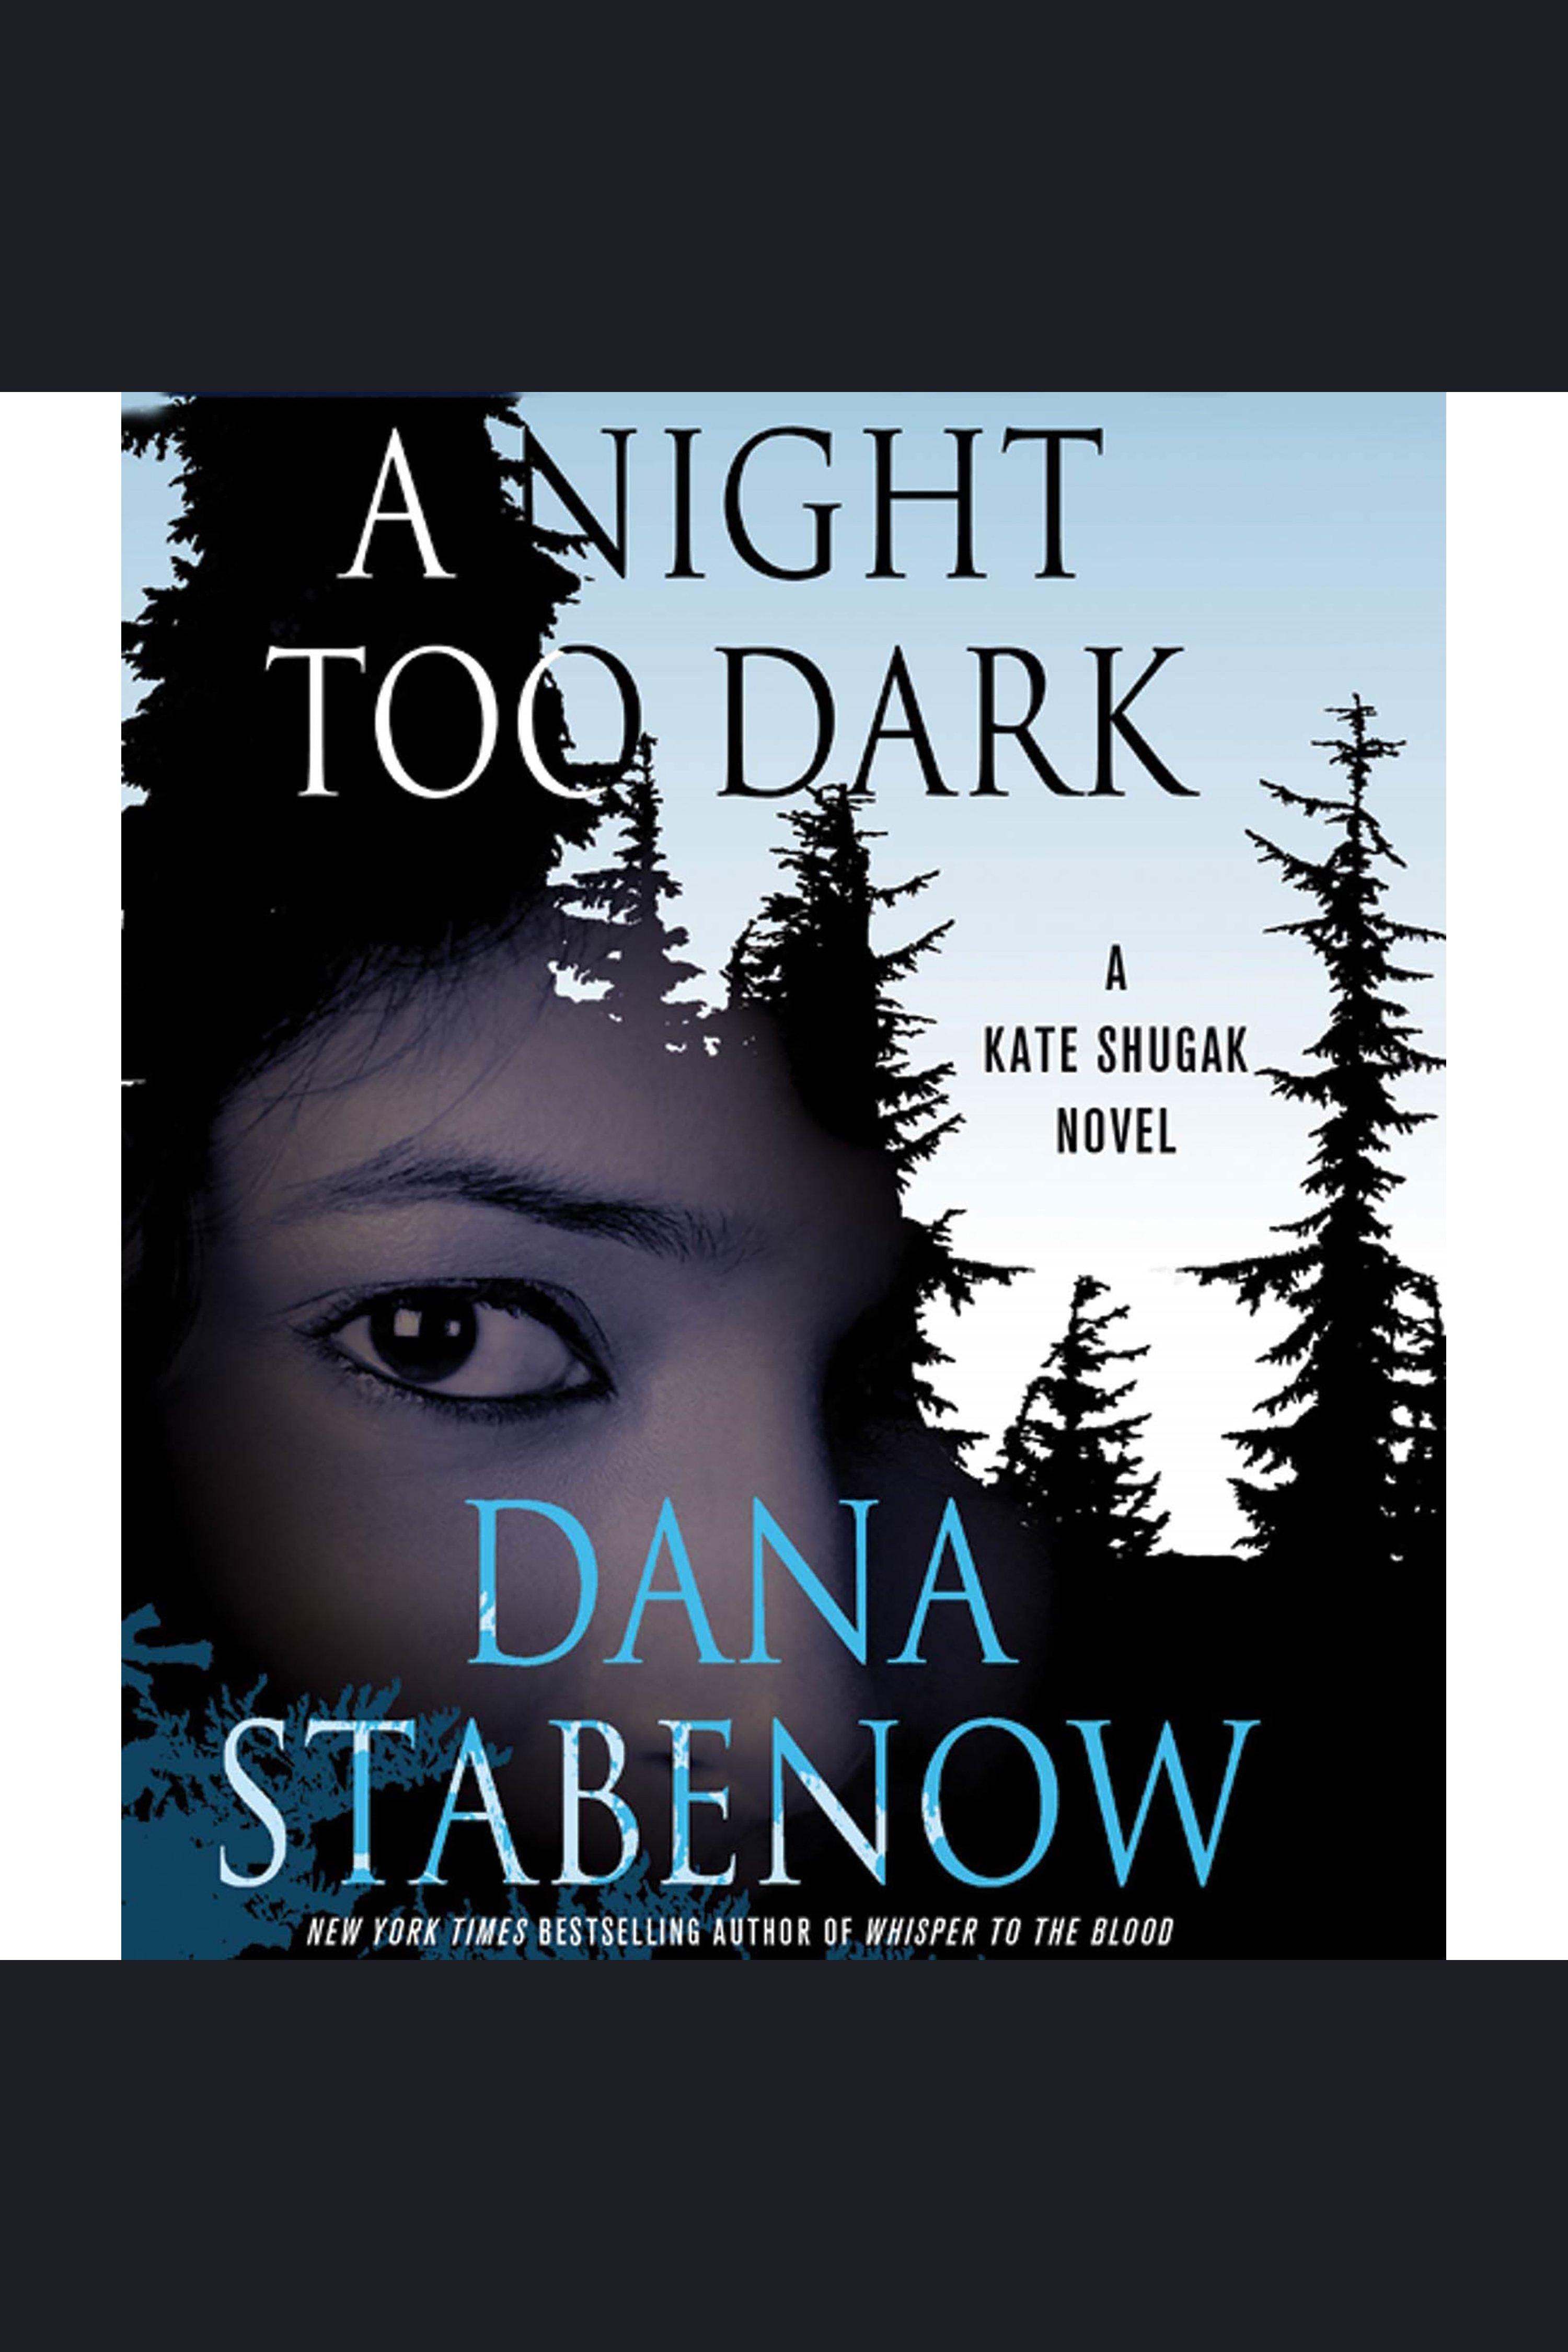 Night too dark cover image